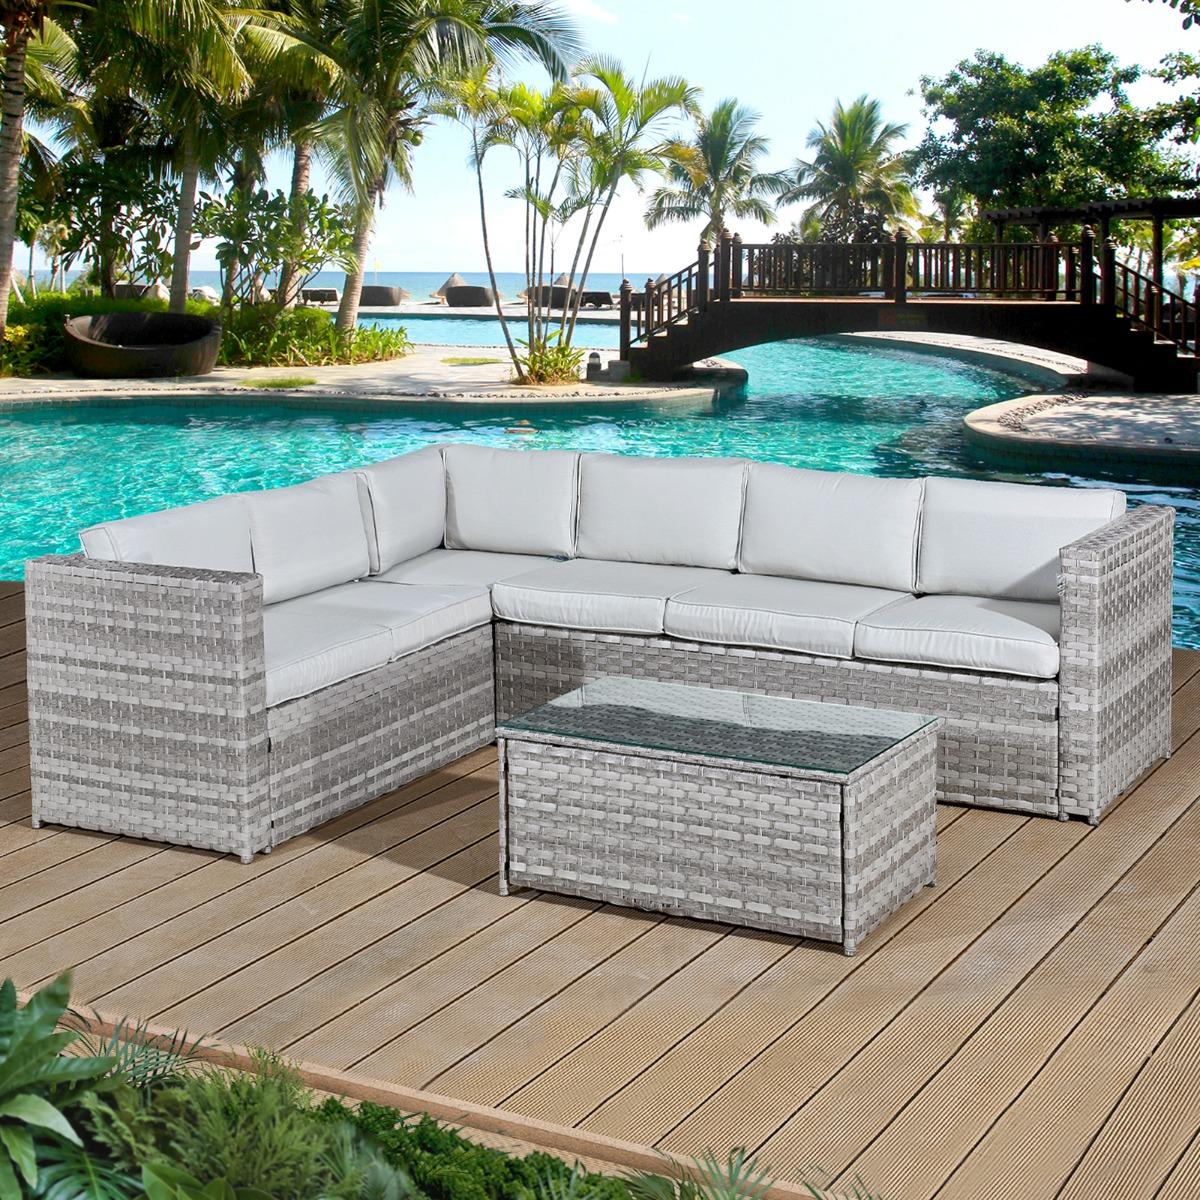 Acorn Rattan 6 Seat Corner Sofa Set in Dove Grey with Light Grey Cushions